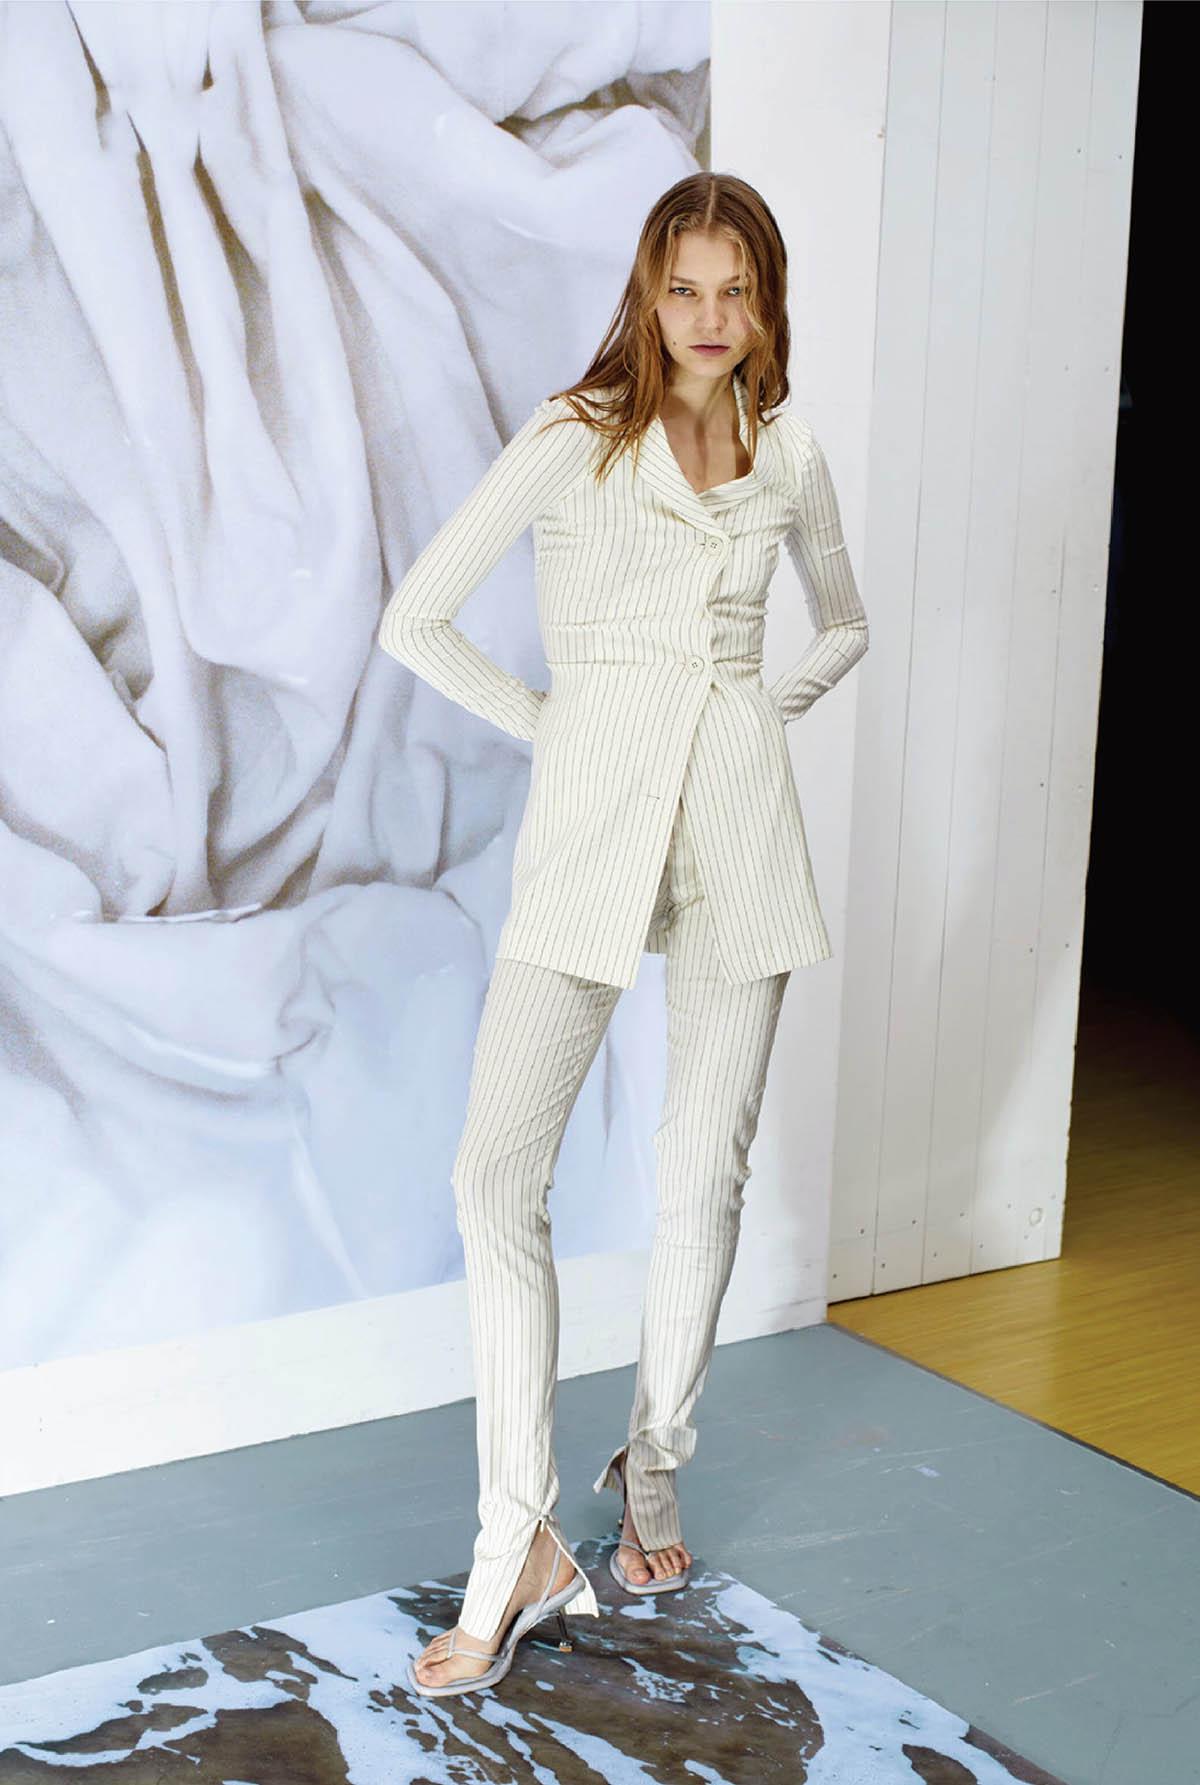 Deirdre Firinne and Yuki van Gog by Markus Pritzi for Vogue Netherlands March 2021